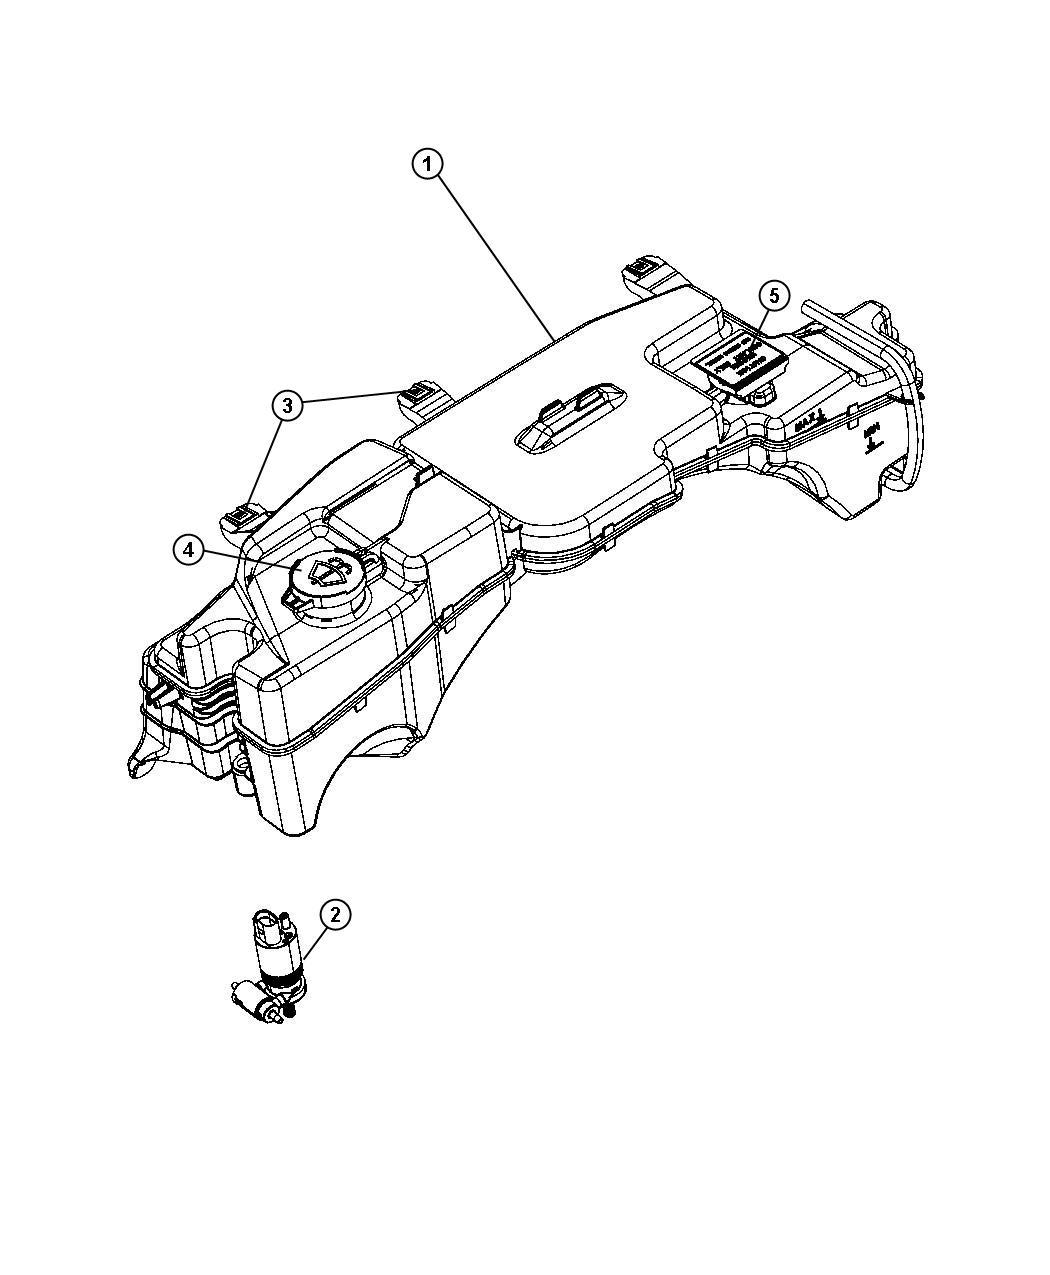 i2194307 2016 dodge nitro radio wiring diagram wiring diagram,2004 Dodge Ram Fuse Box